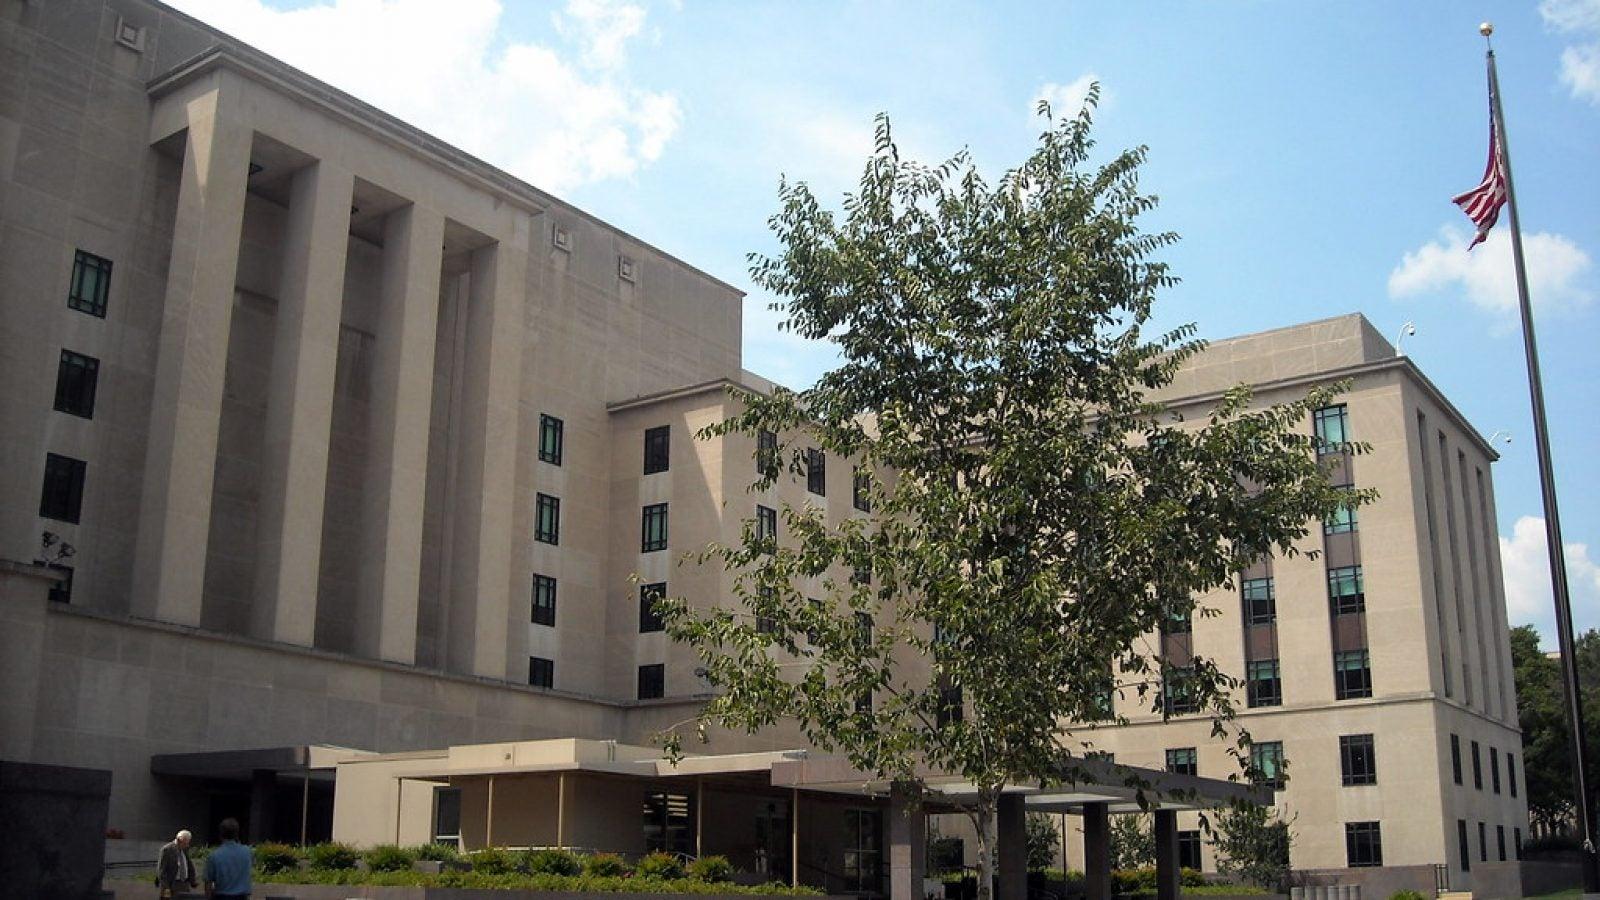 Harry S. Truman Building, U.S. Department of State